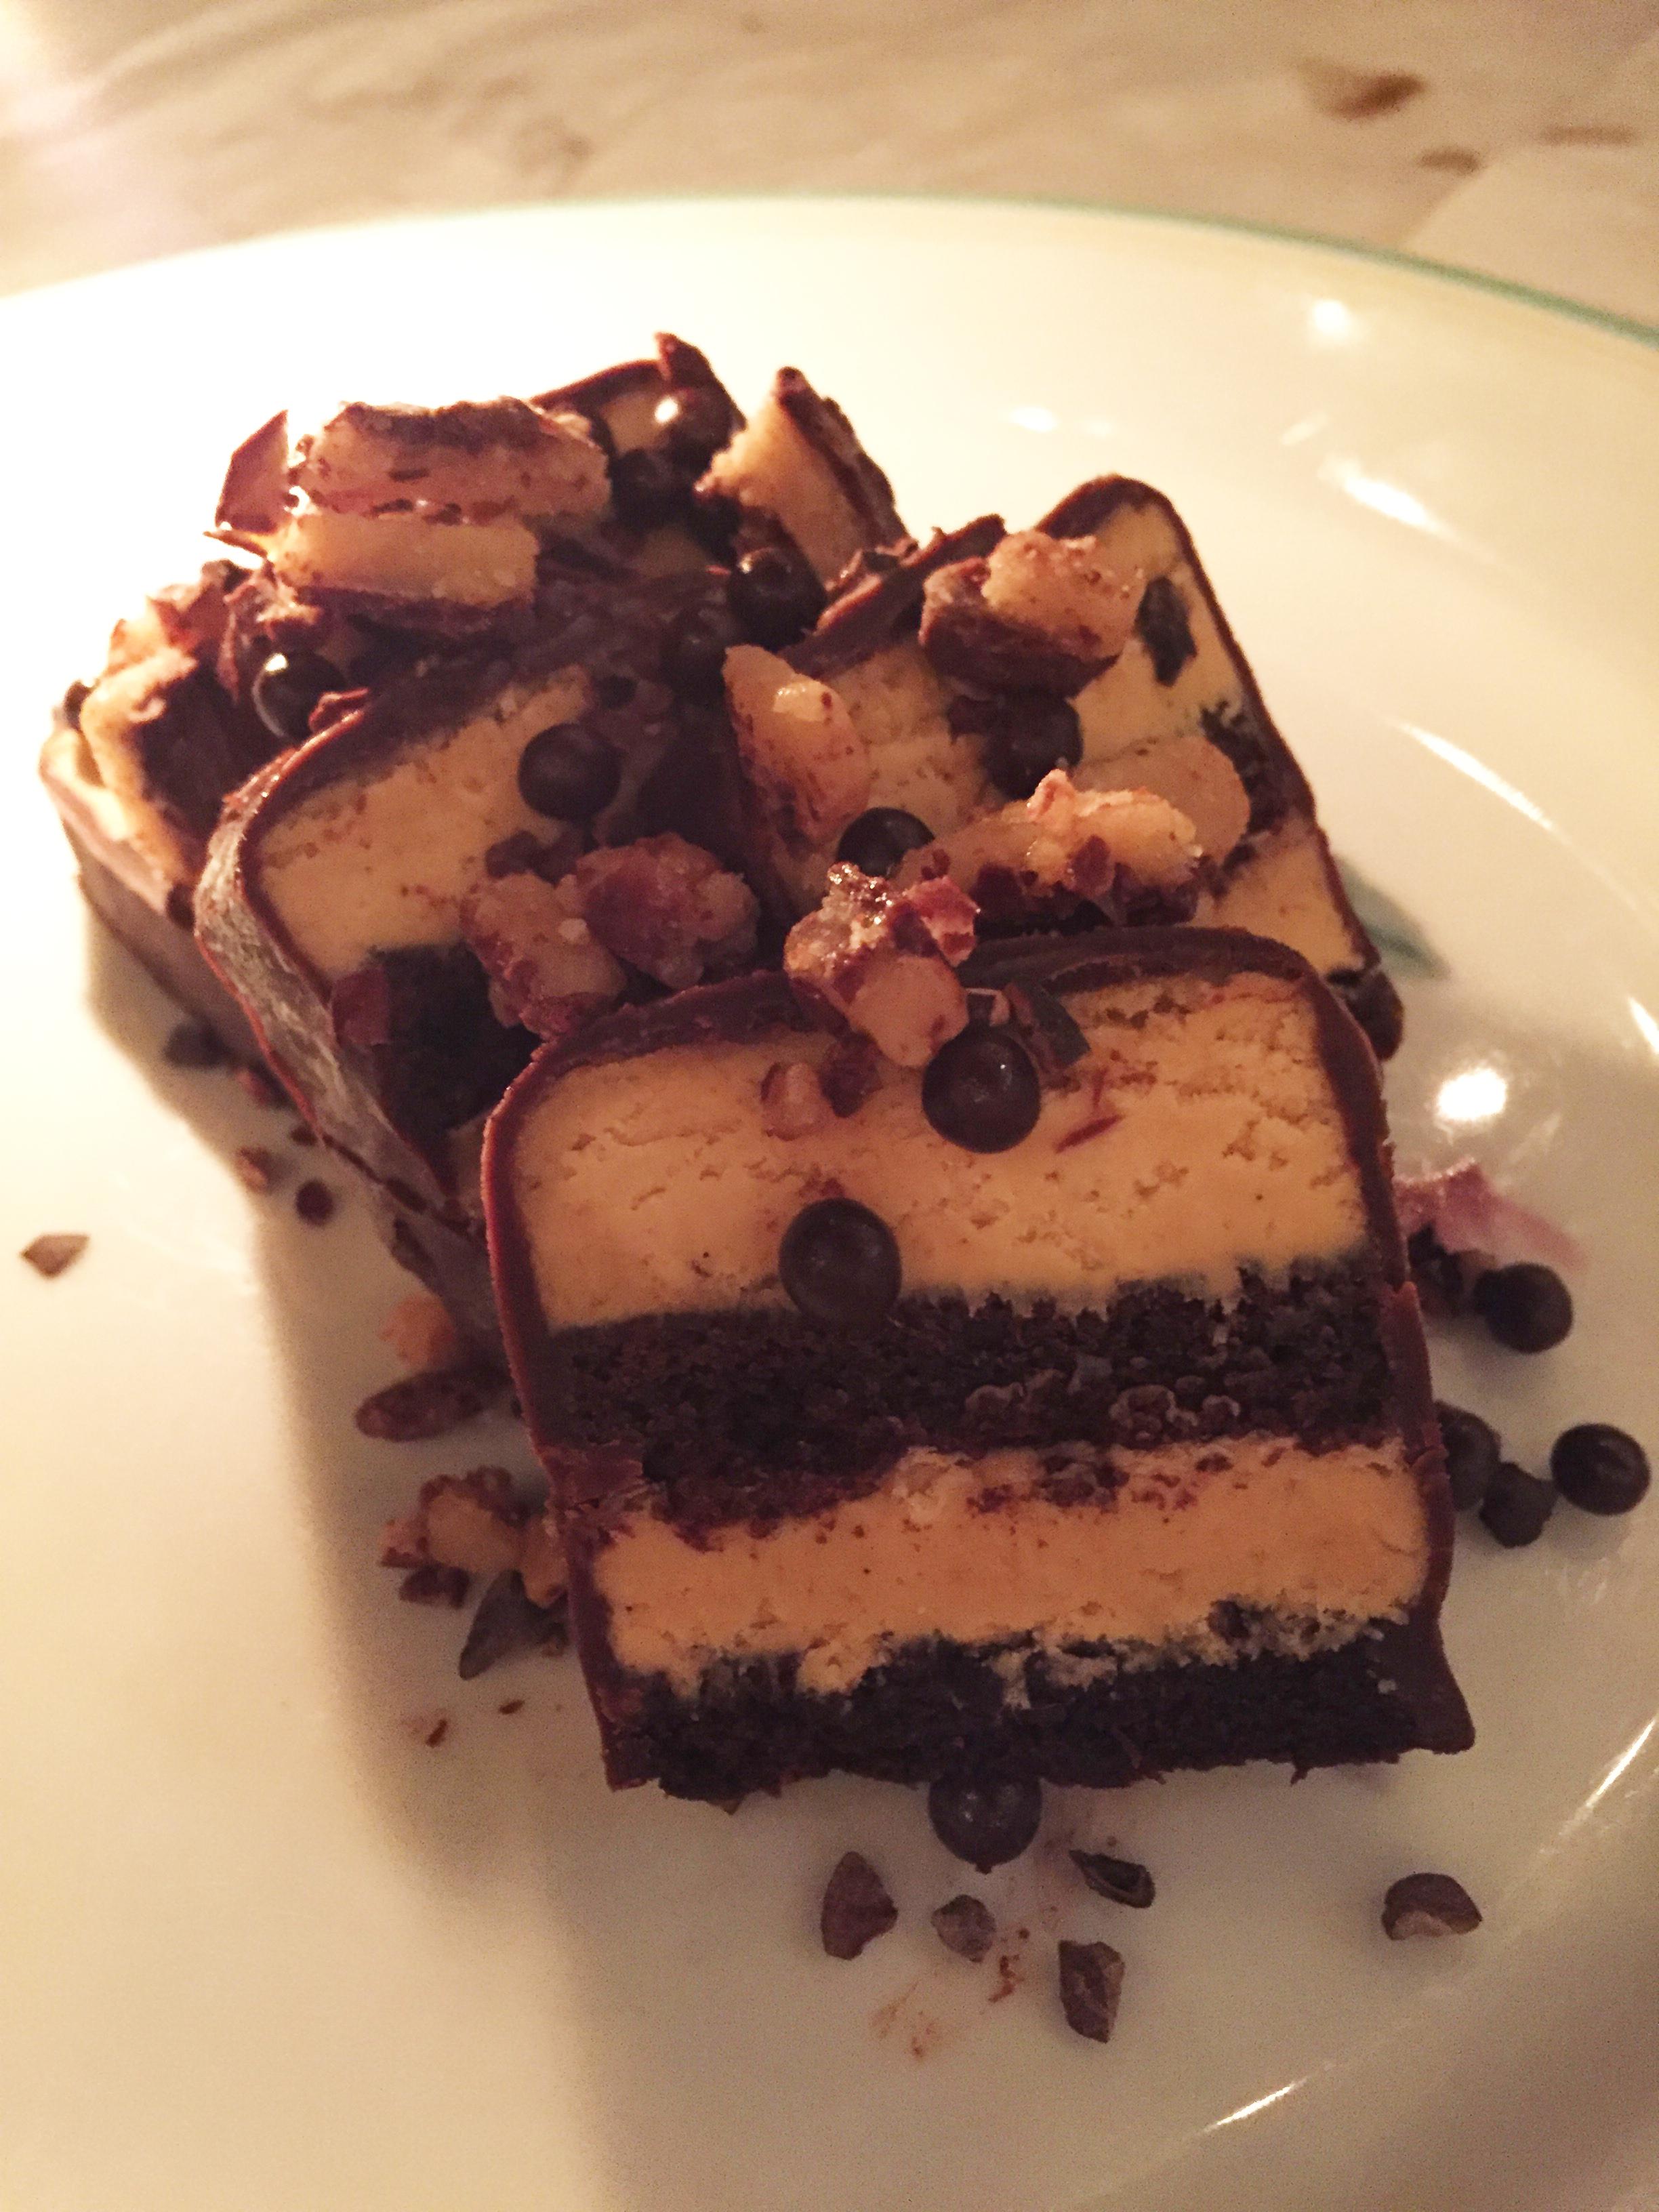 Birthday Cake with chocolate ganache, sea salt, caramel, and toffee.